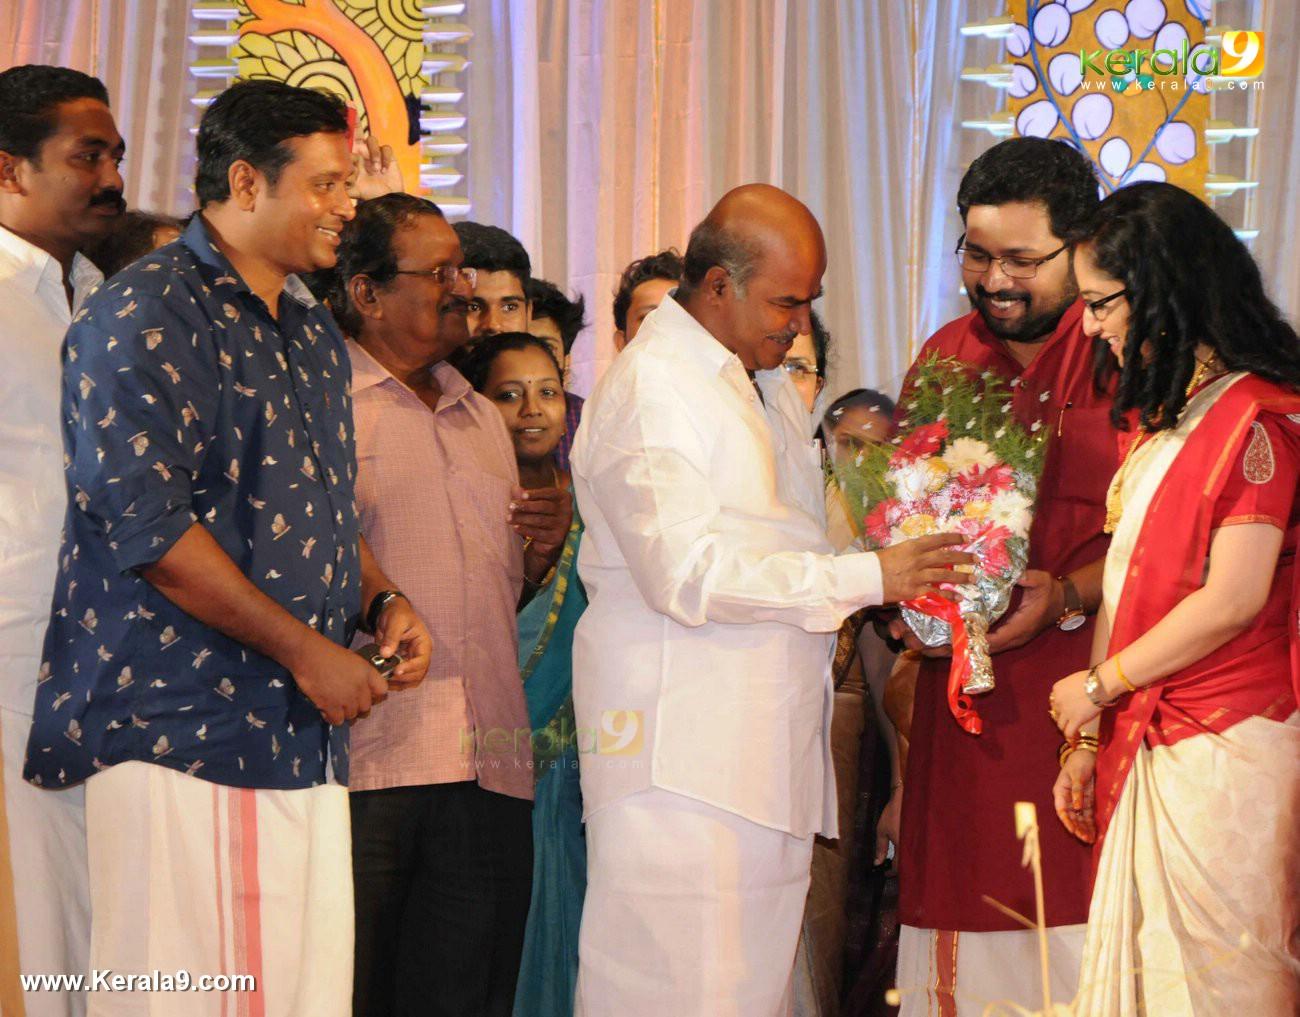 sabarinathan mla wedding photos 009